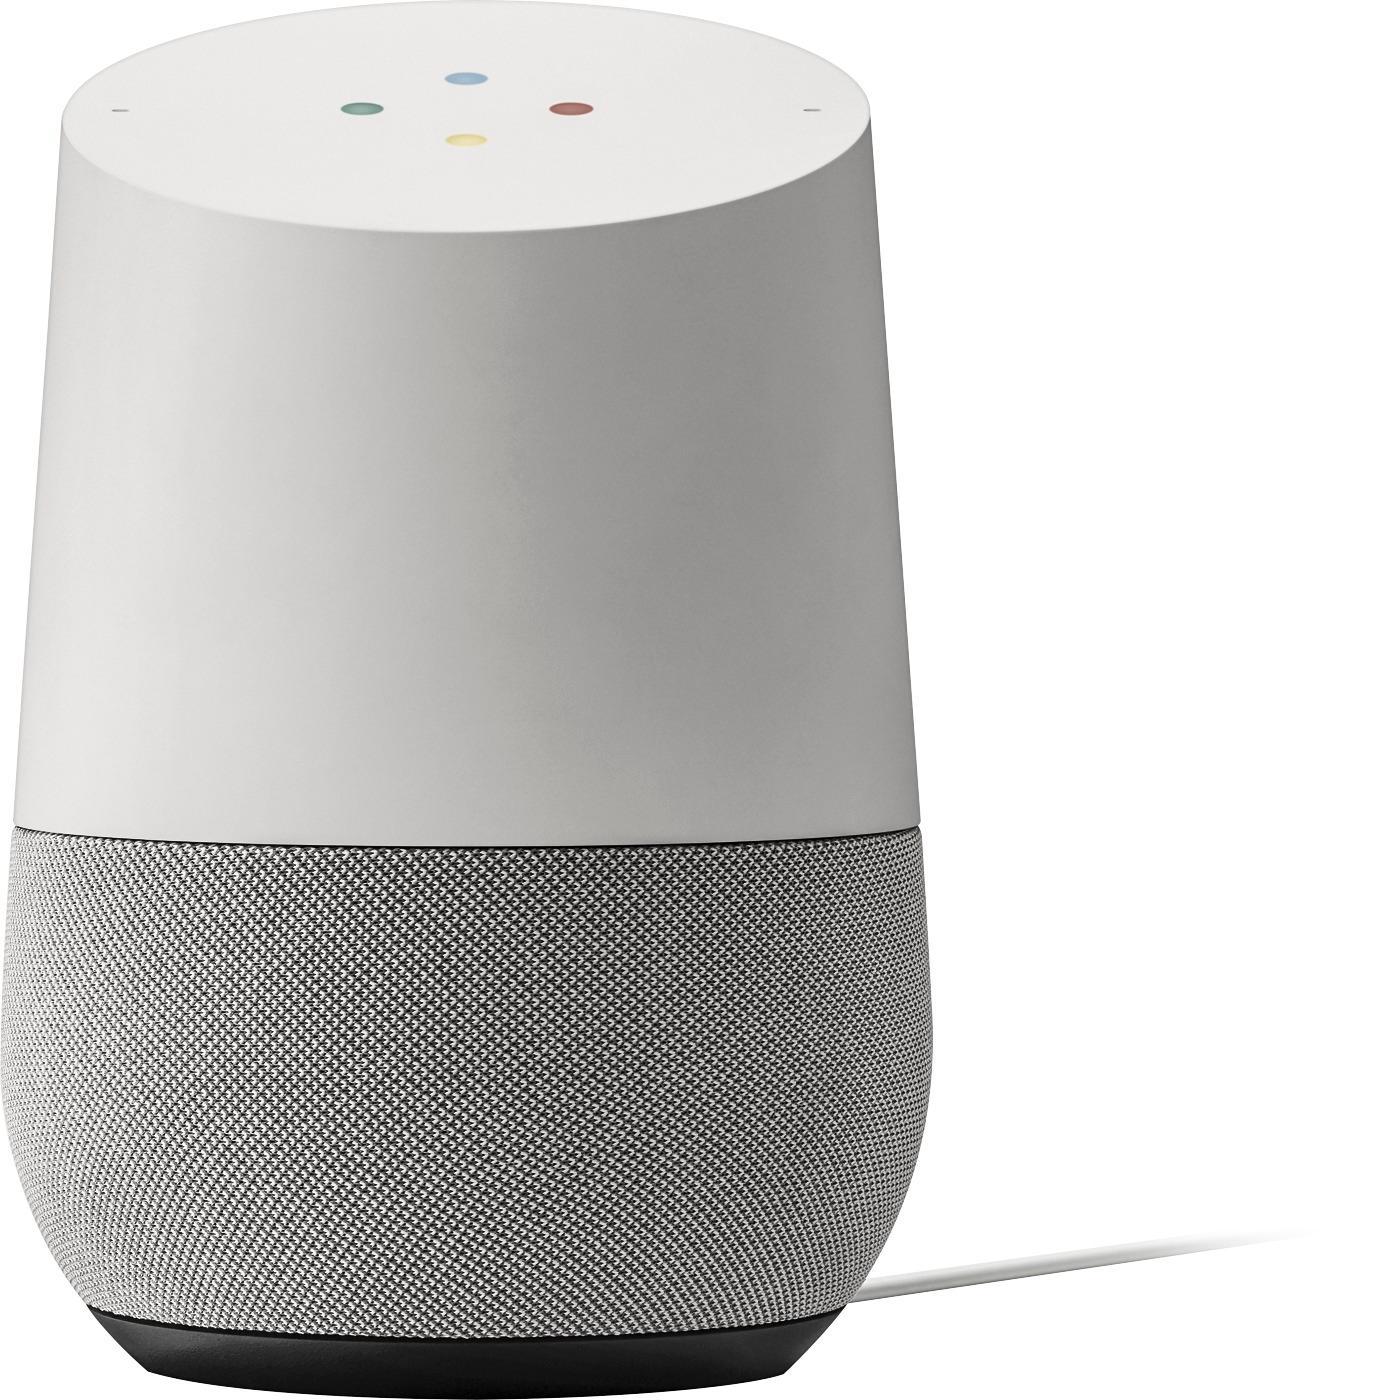 Google - Home - White/Slate fabric